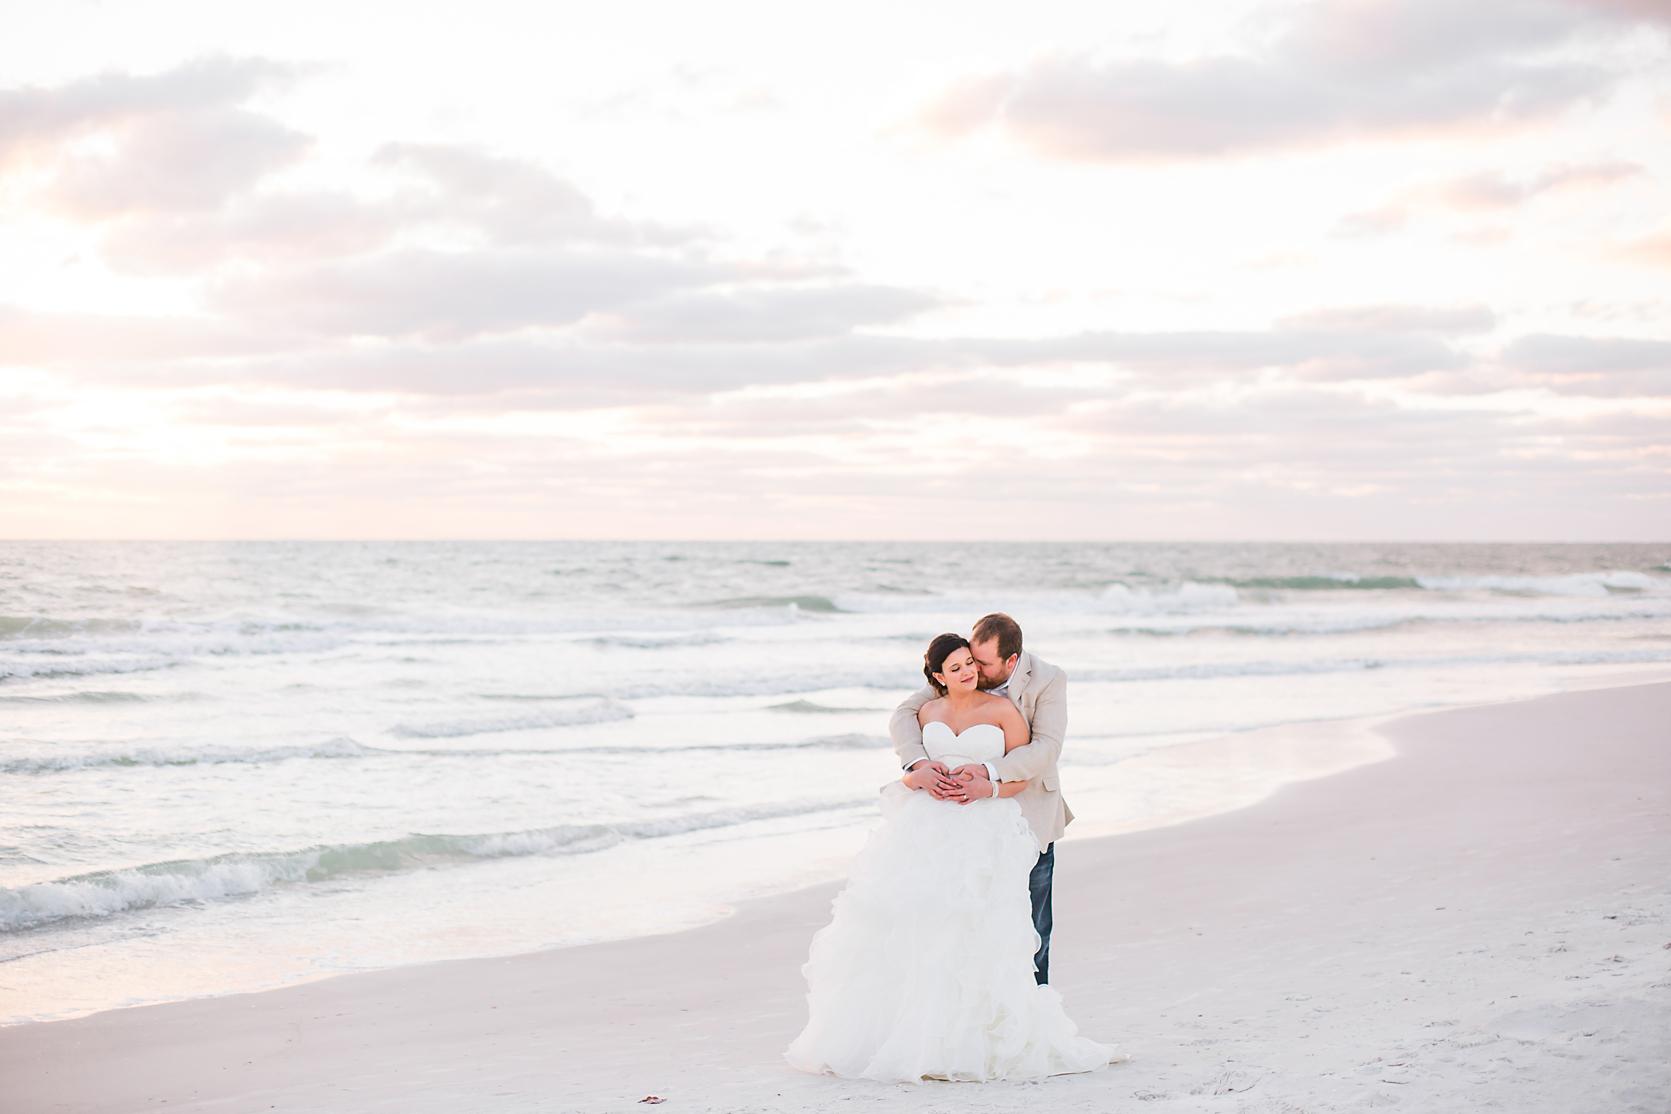 Bailey + Chalin - Anna Maria Island Wedding Photographer - Destination Wedding Photography - Emily & Co. Photography - Beach Wedding Photography 193.jpg